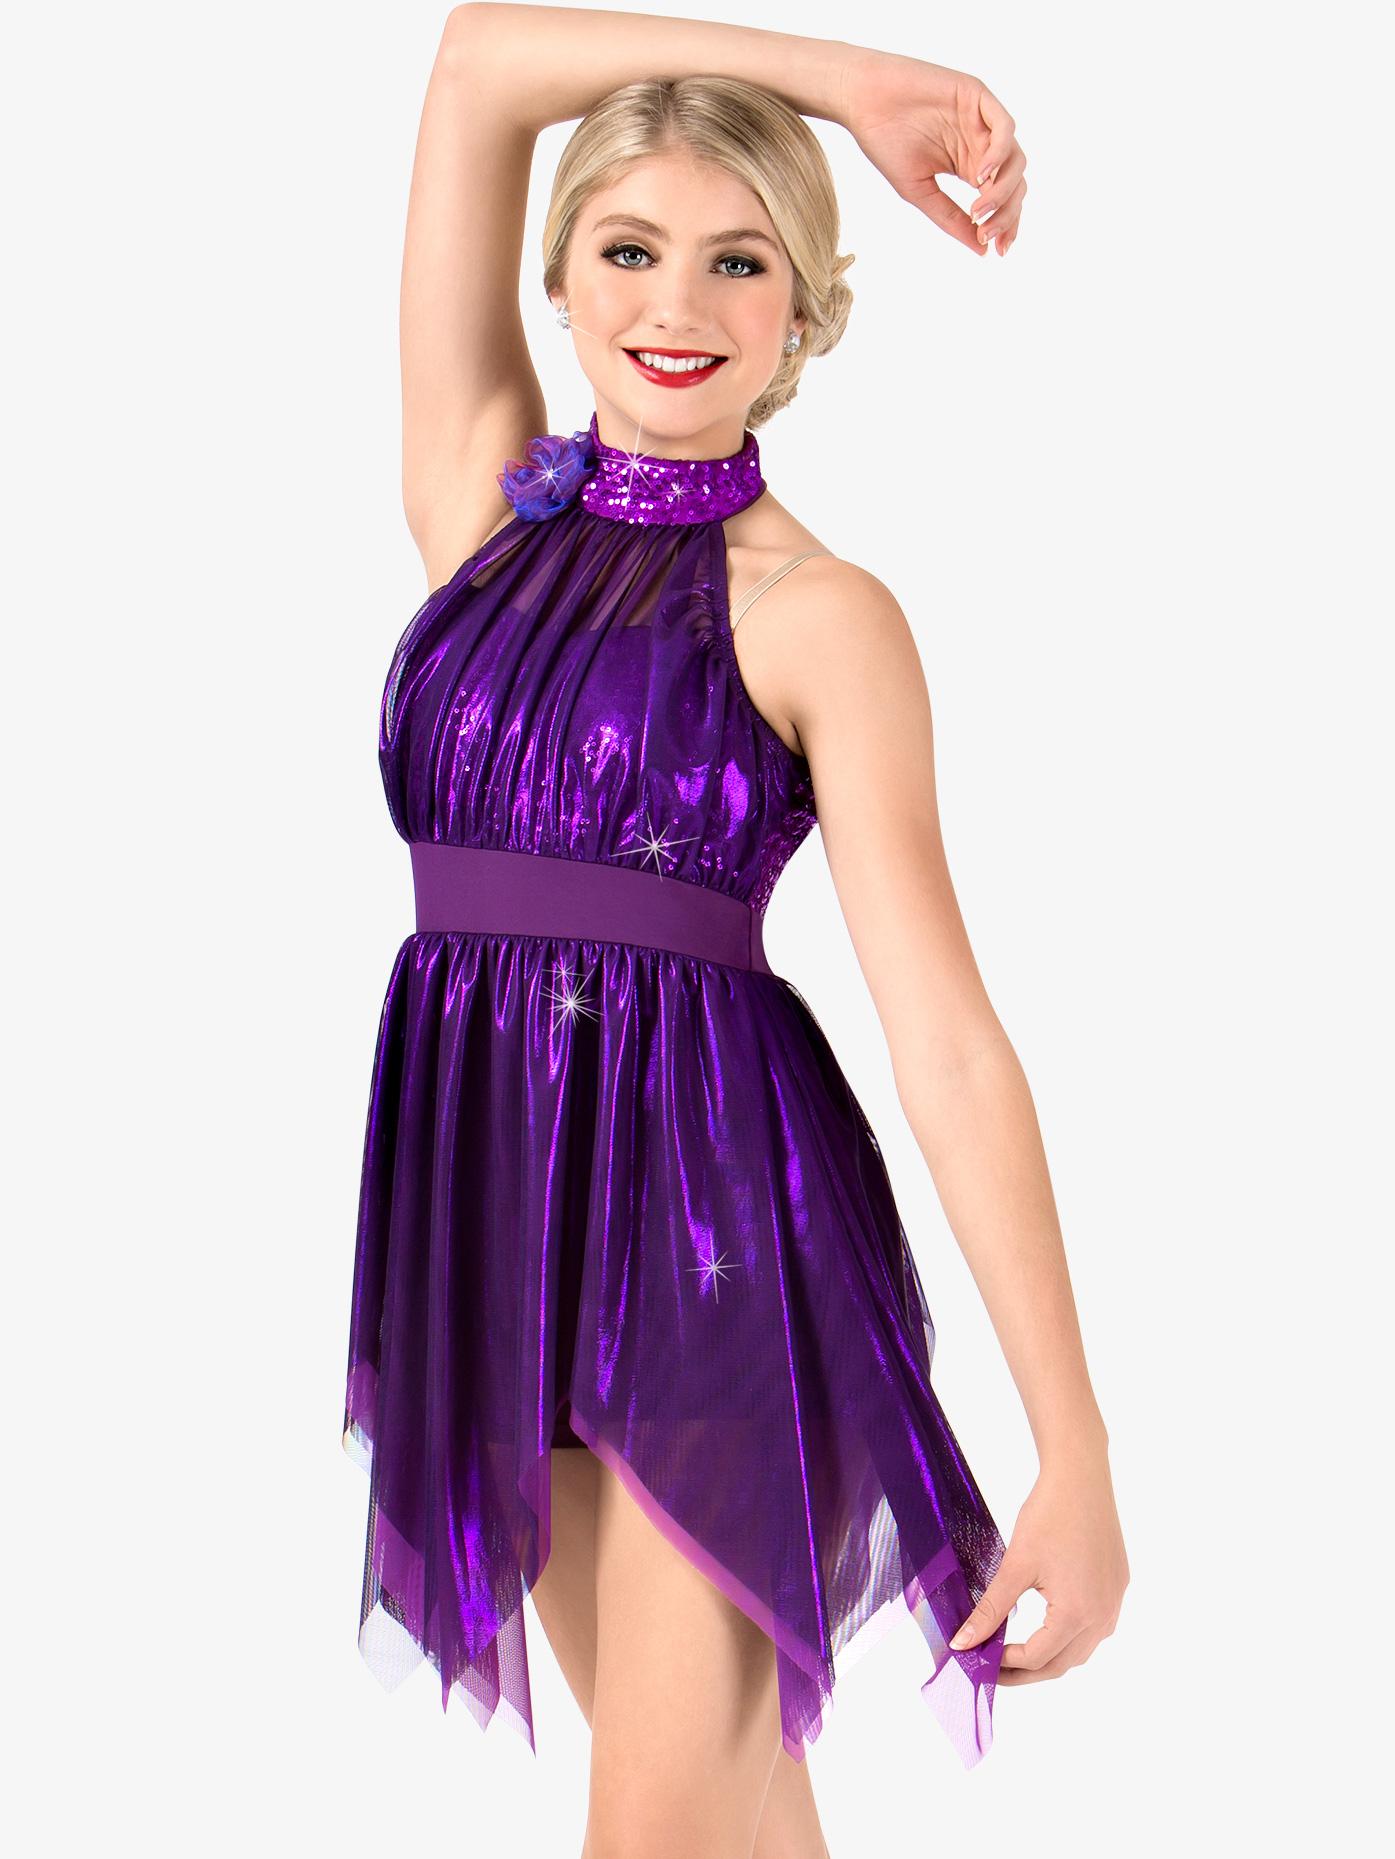 Elisse by Double Platinum Womens Metallic High Neck Handkerchief Performance Dress N7465